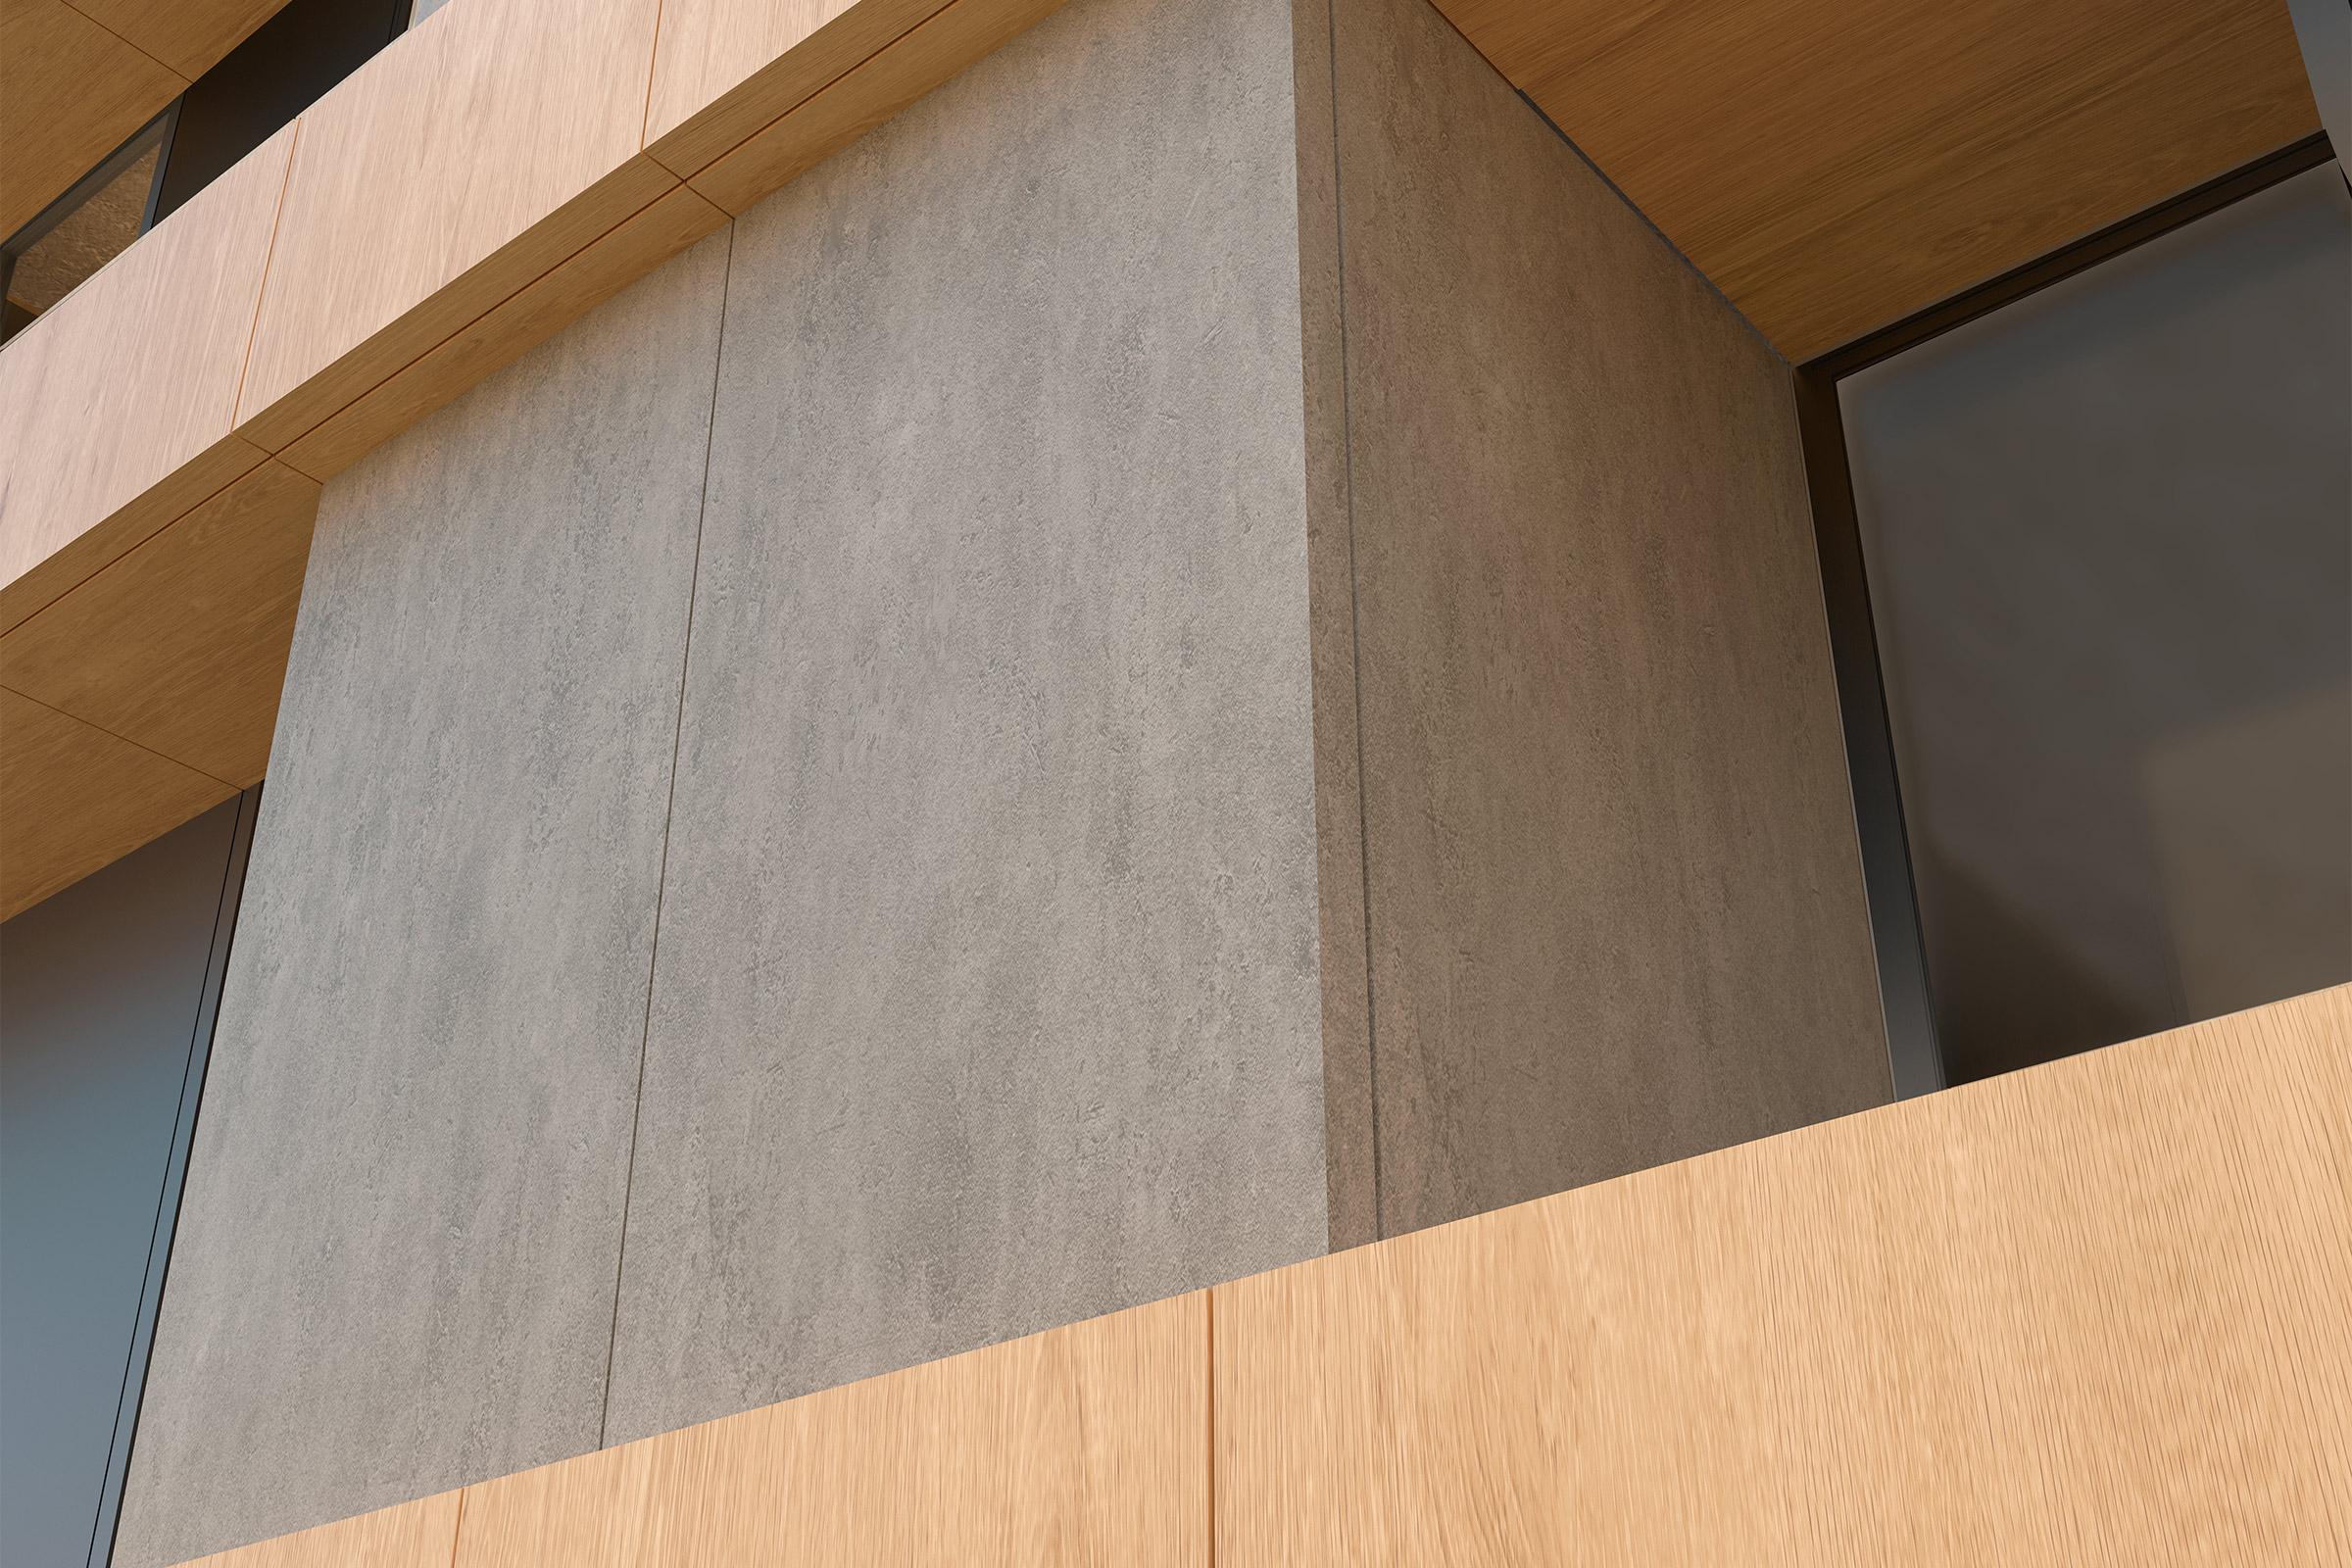 edificio-detallle-1_STB-W05